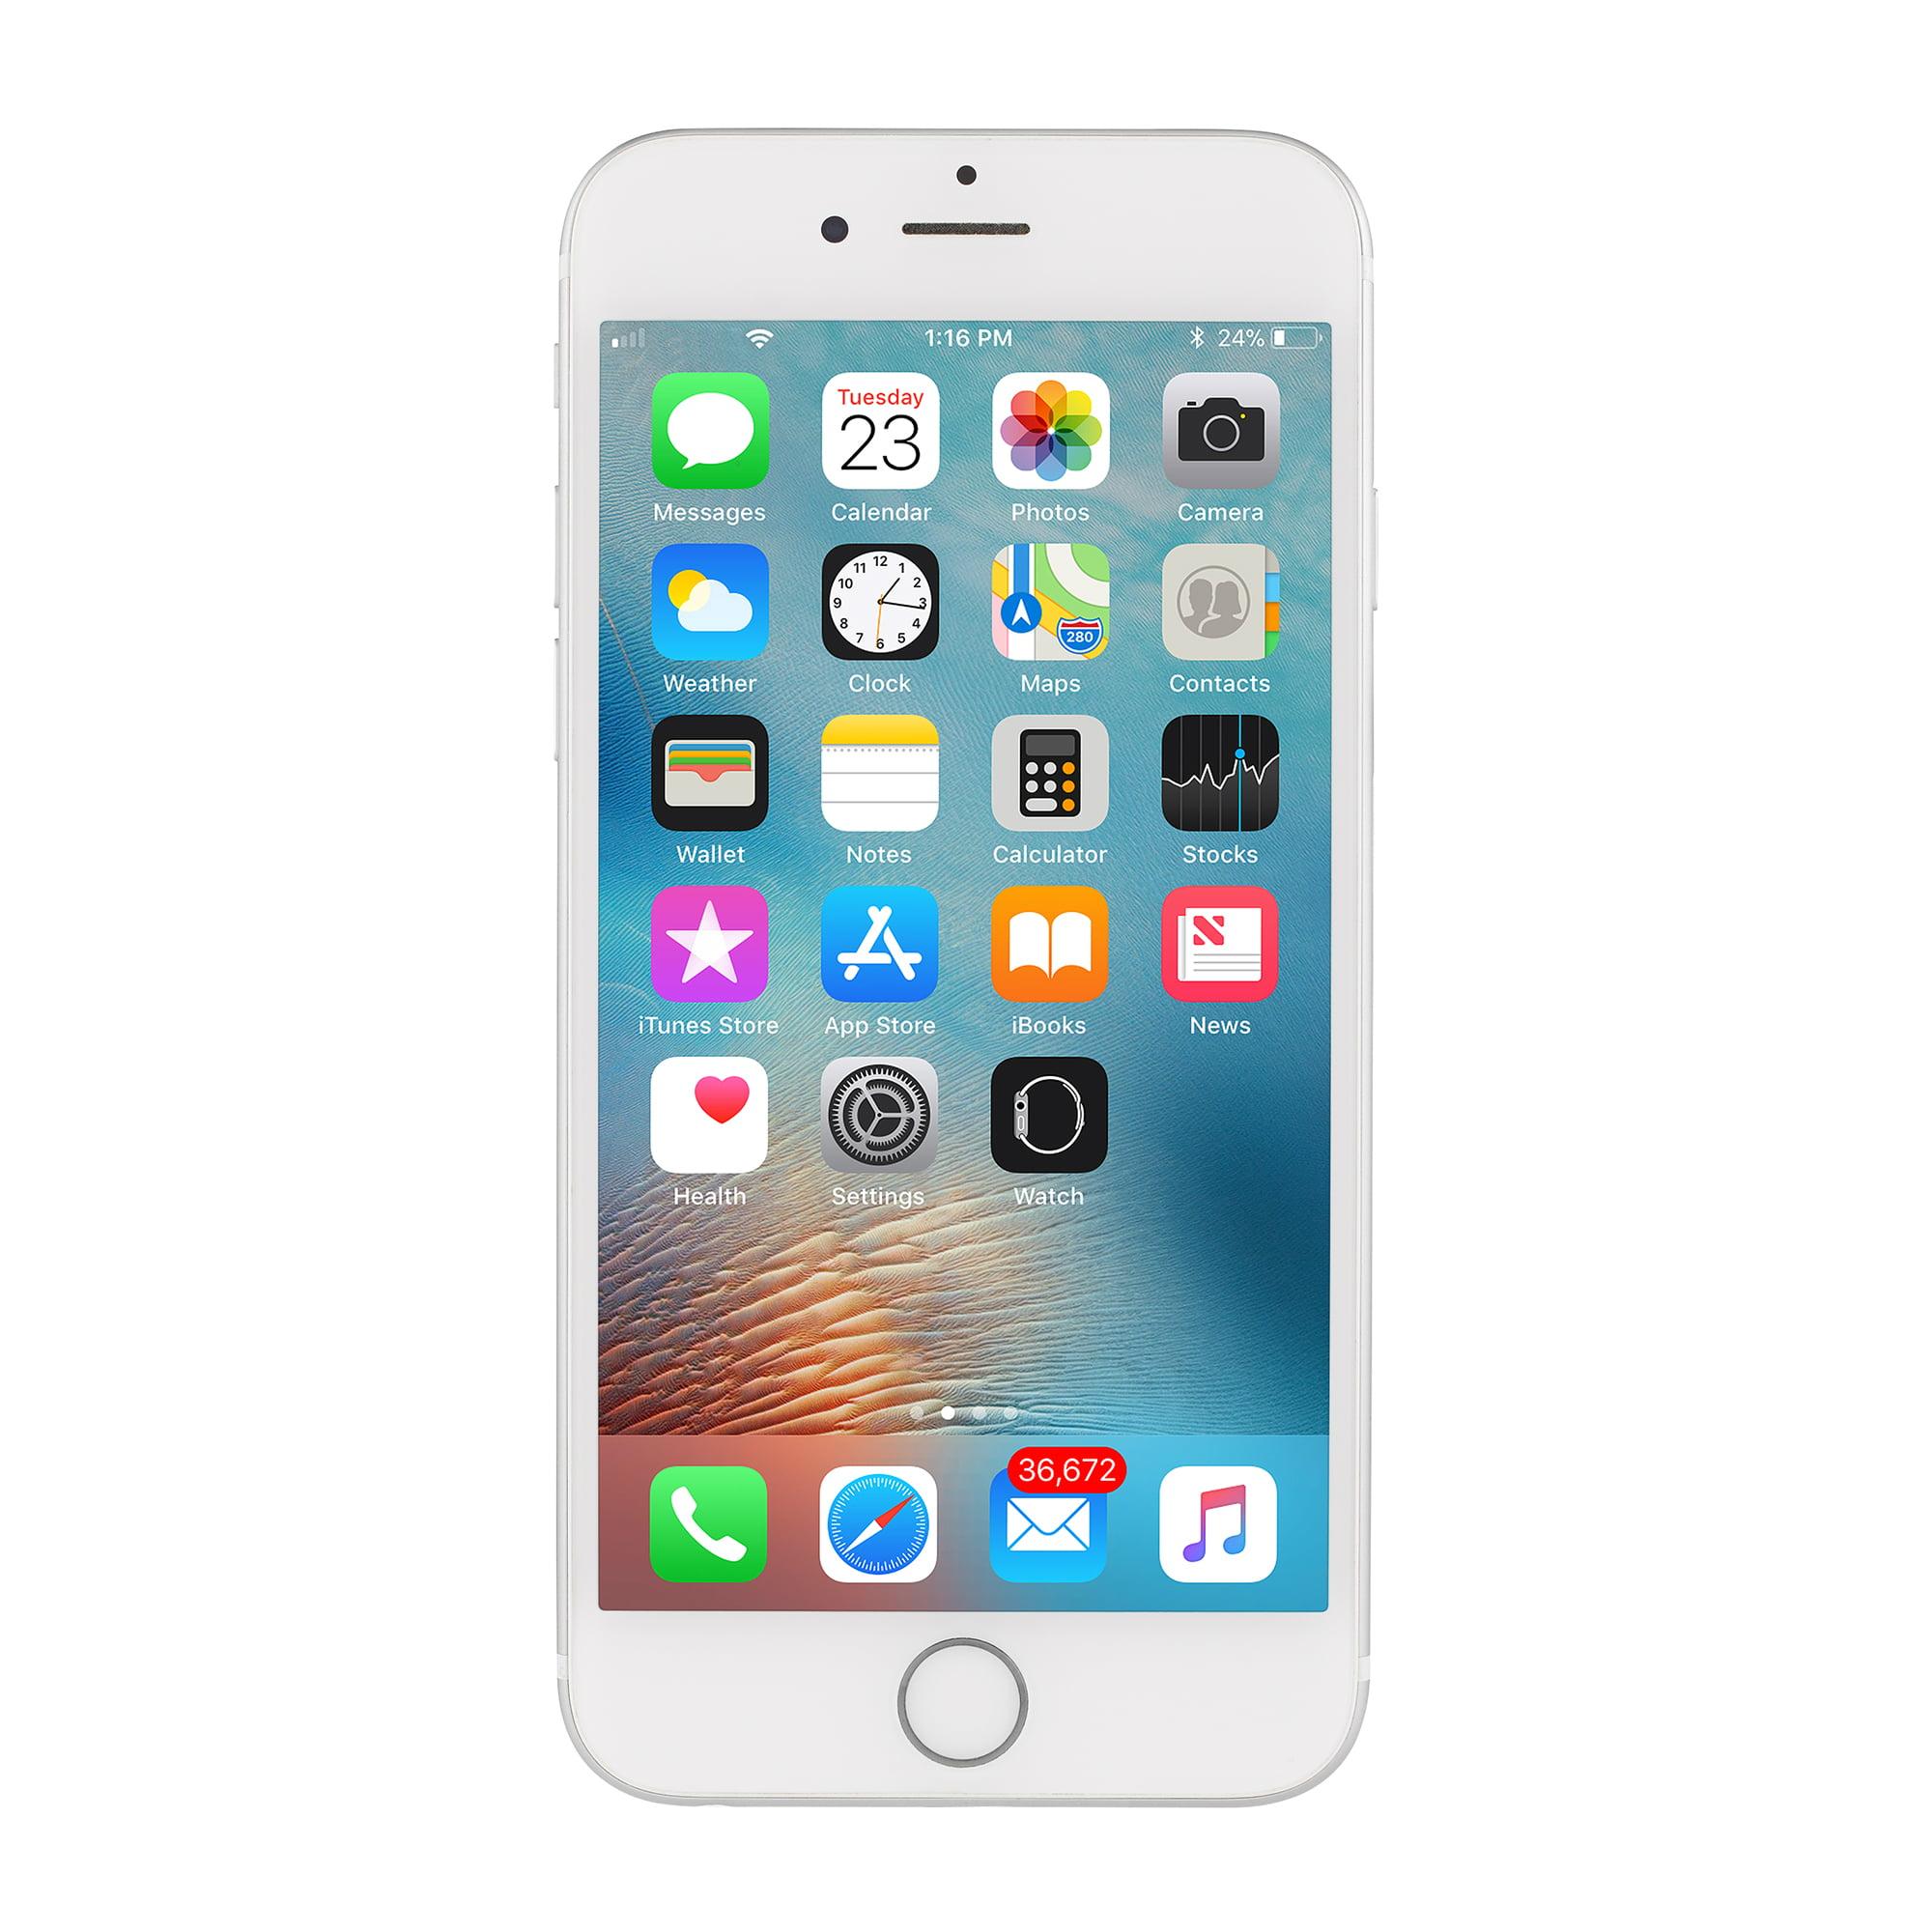 Apple iPhone 6s a1688 16GB GSM Unlocked  (Refurbished)